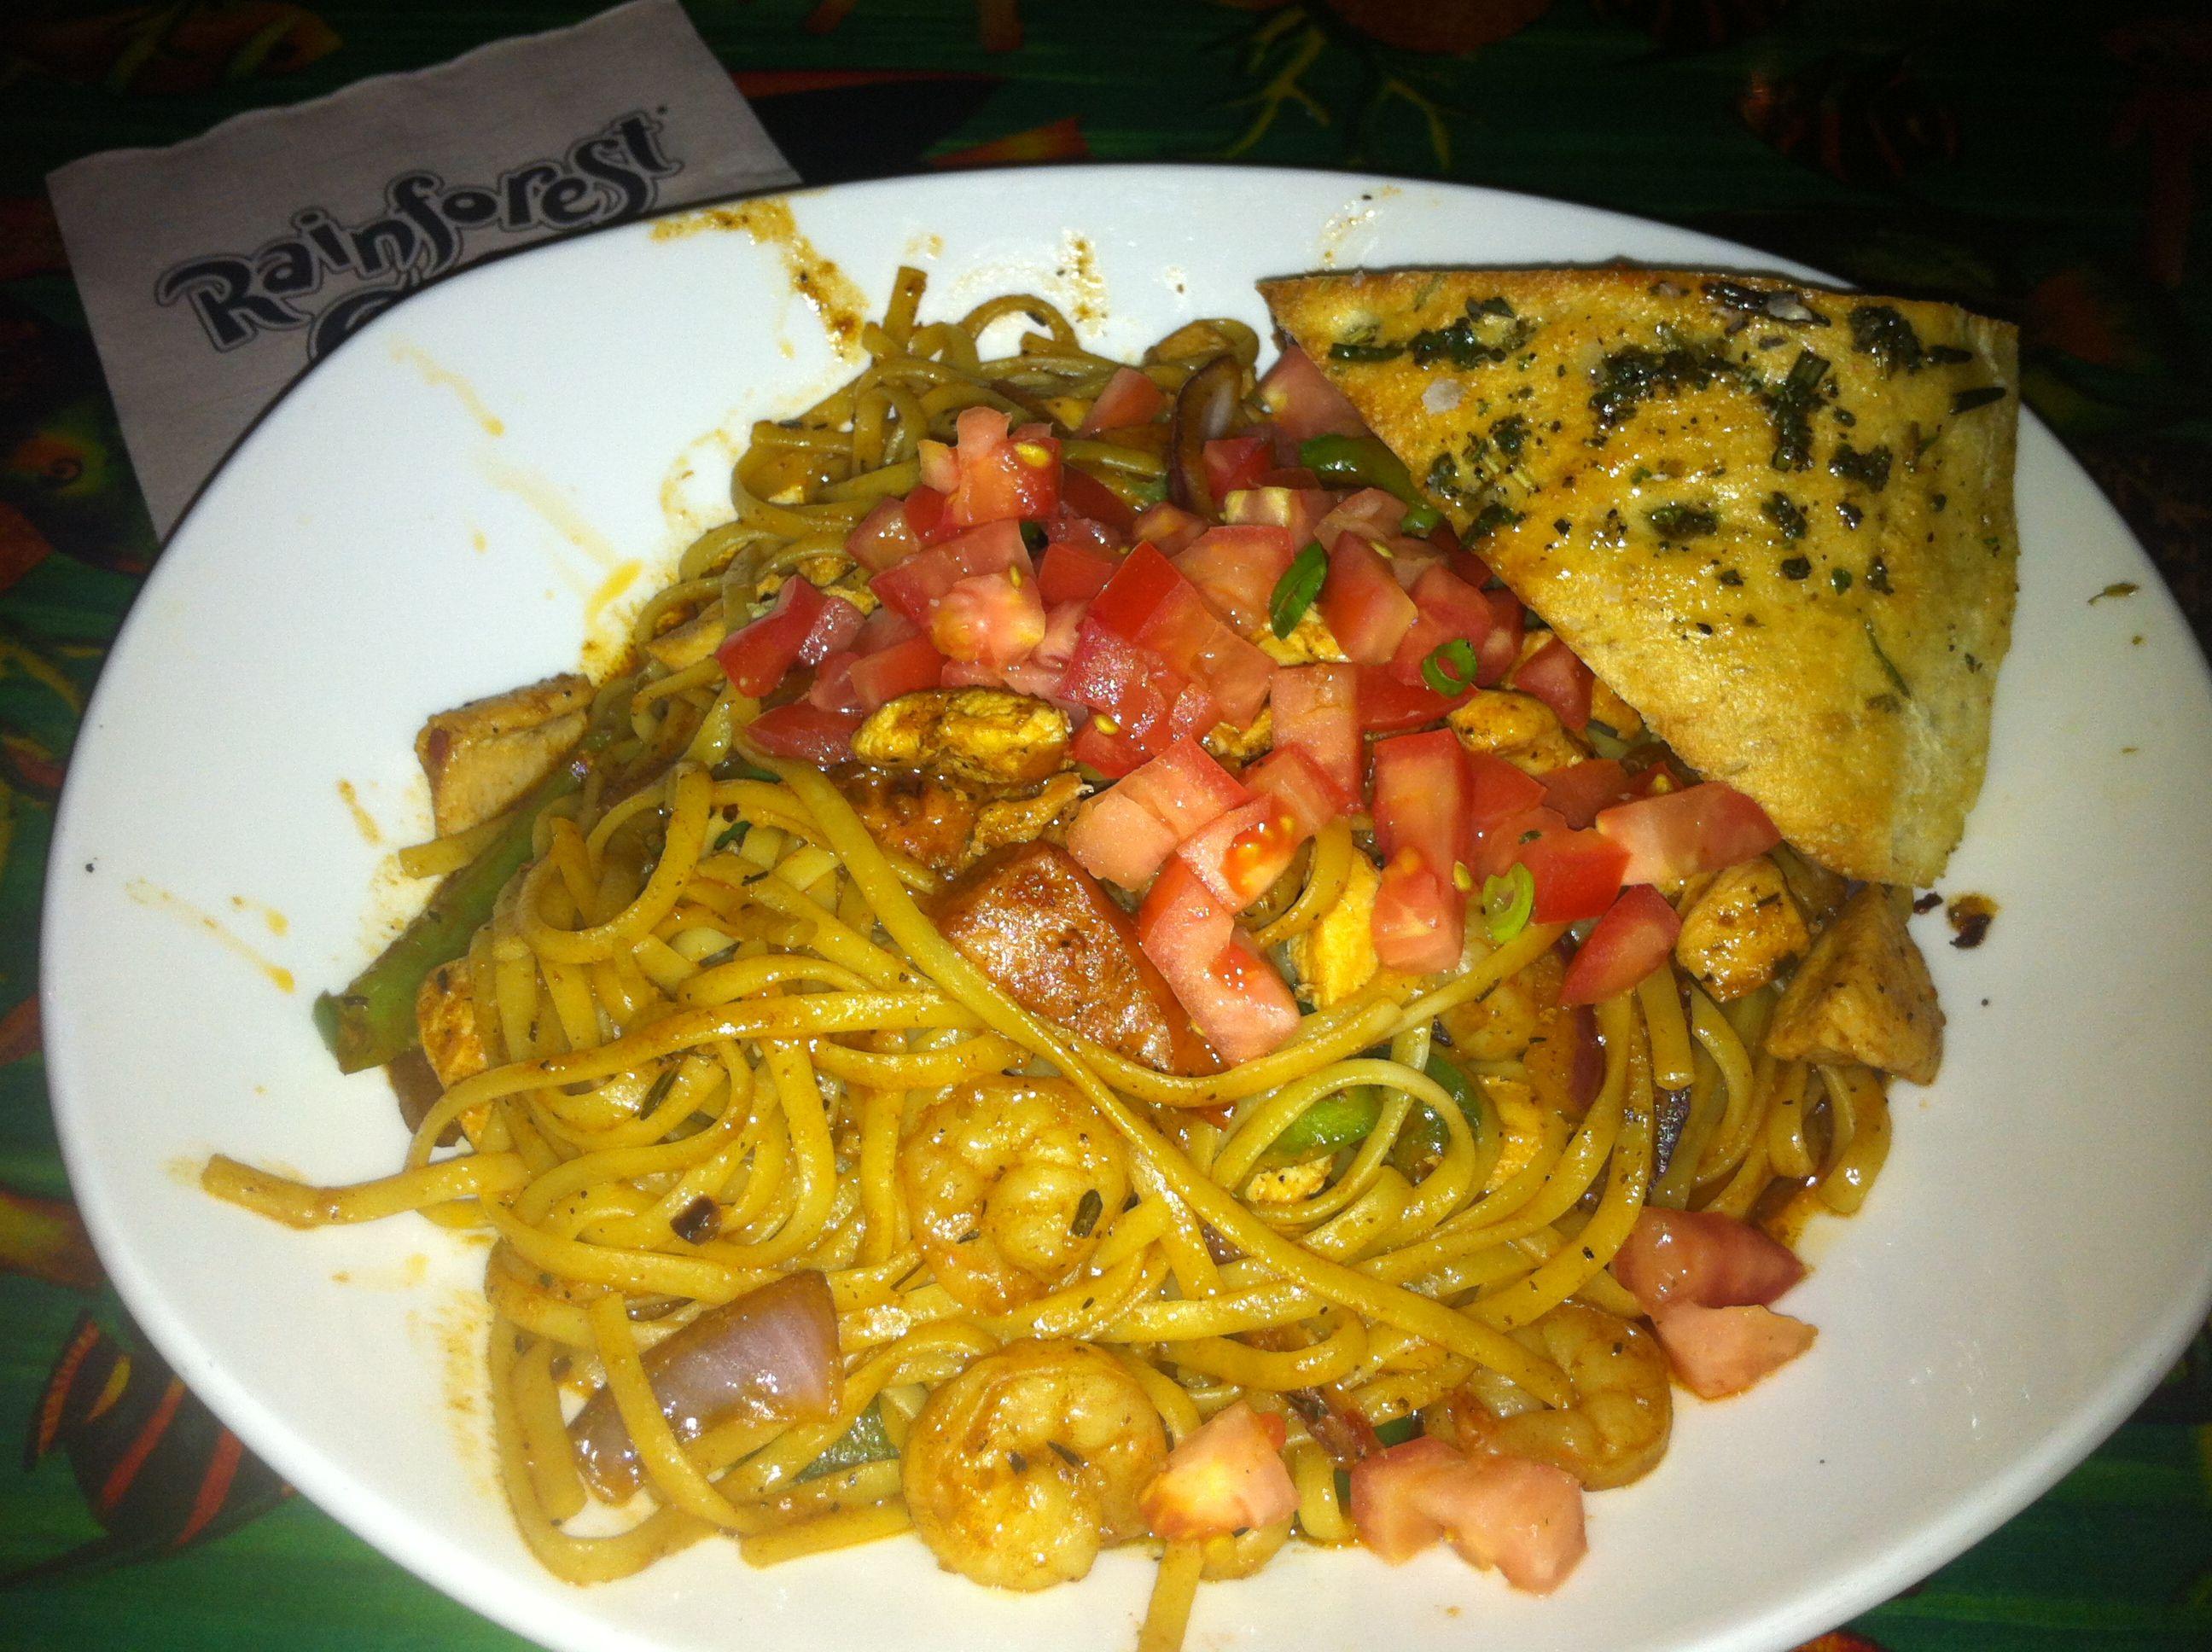 Pastalaya at The Rainforest Cafe in Atlantic City NJ.